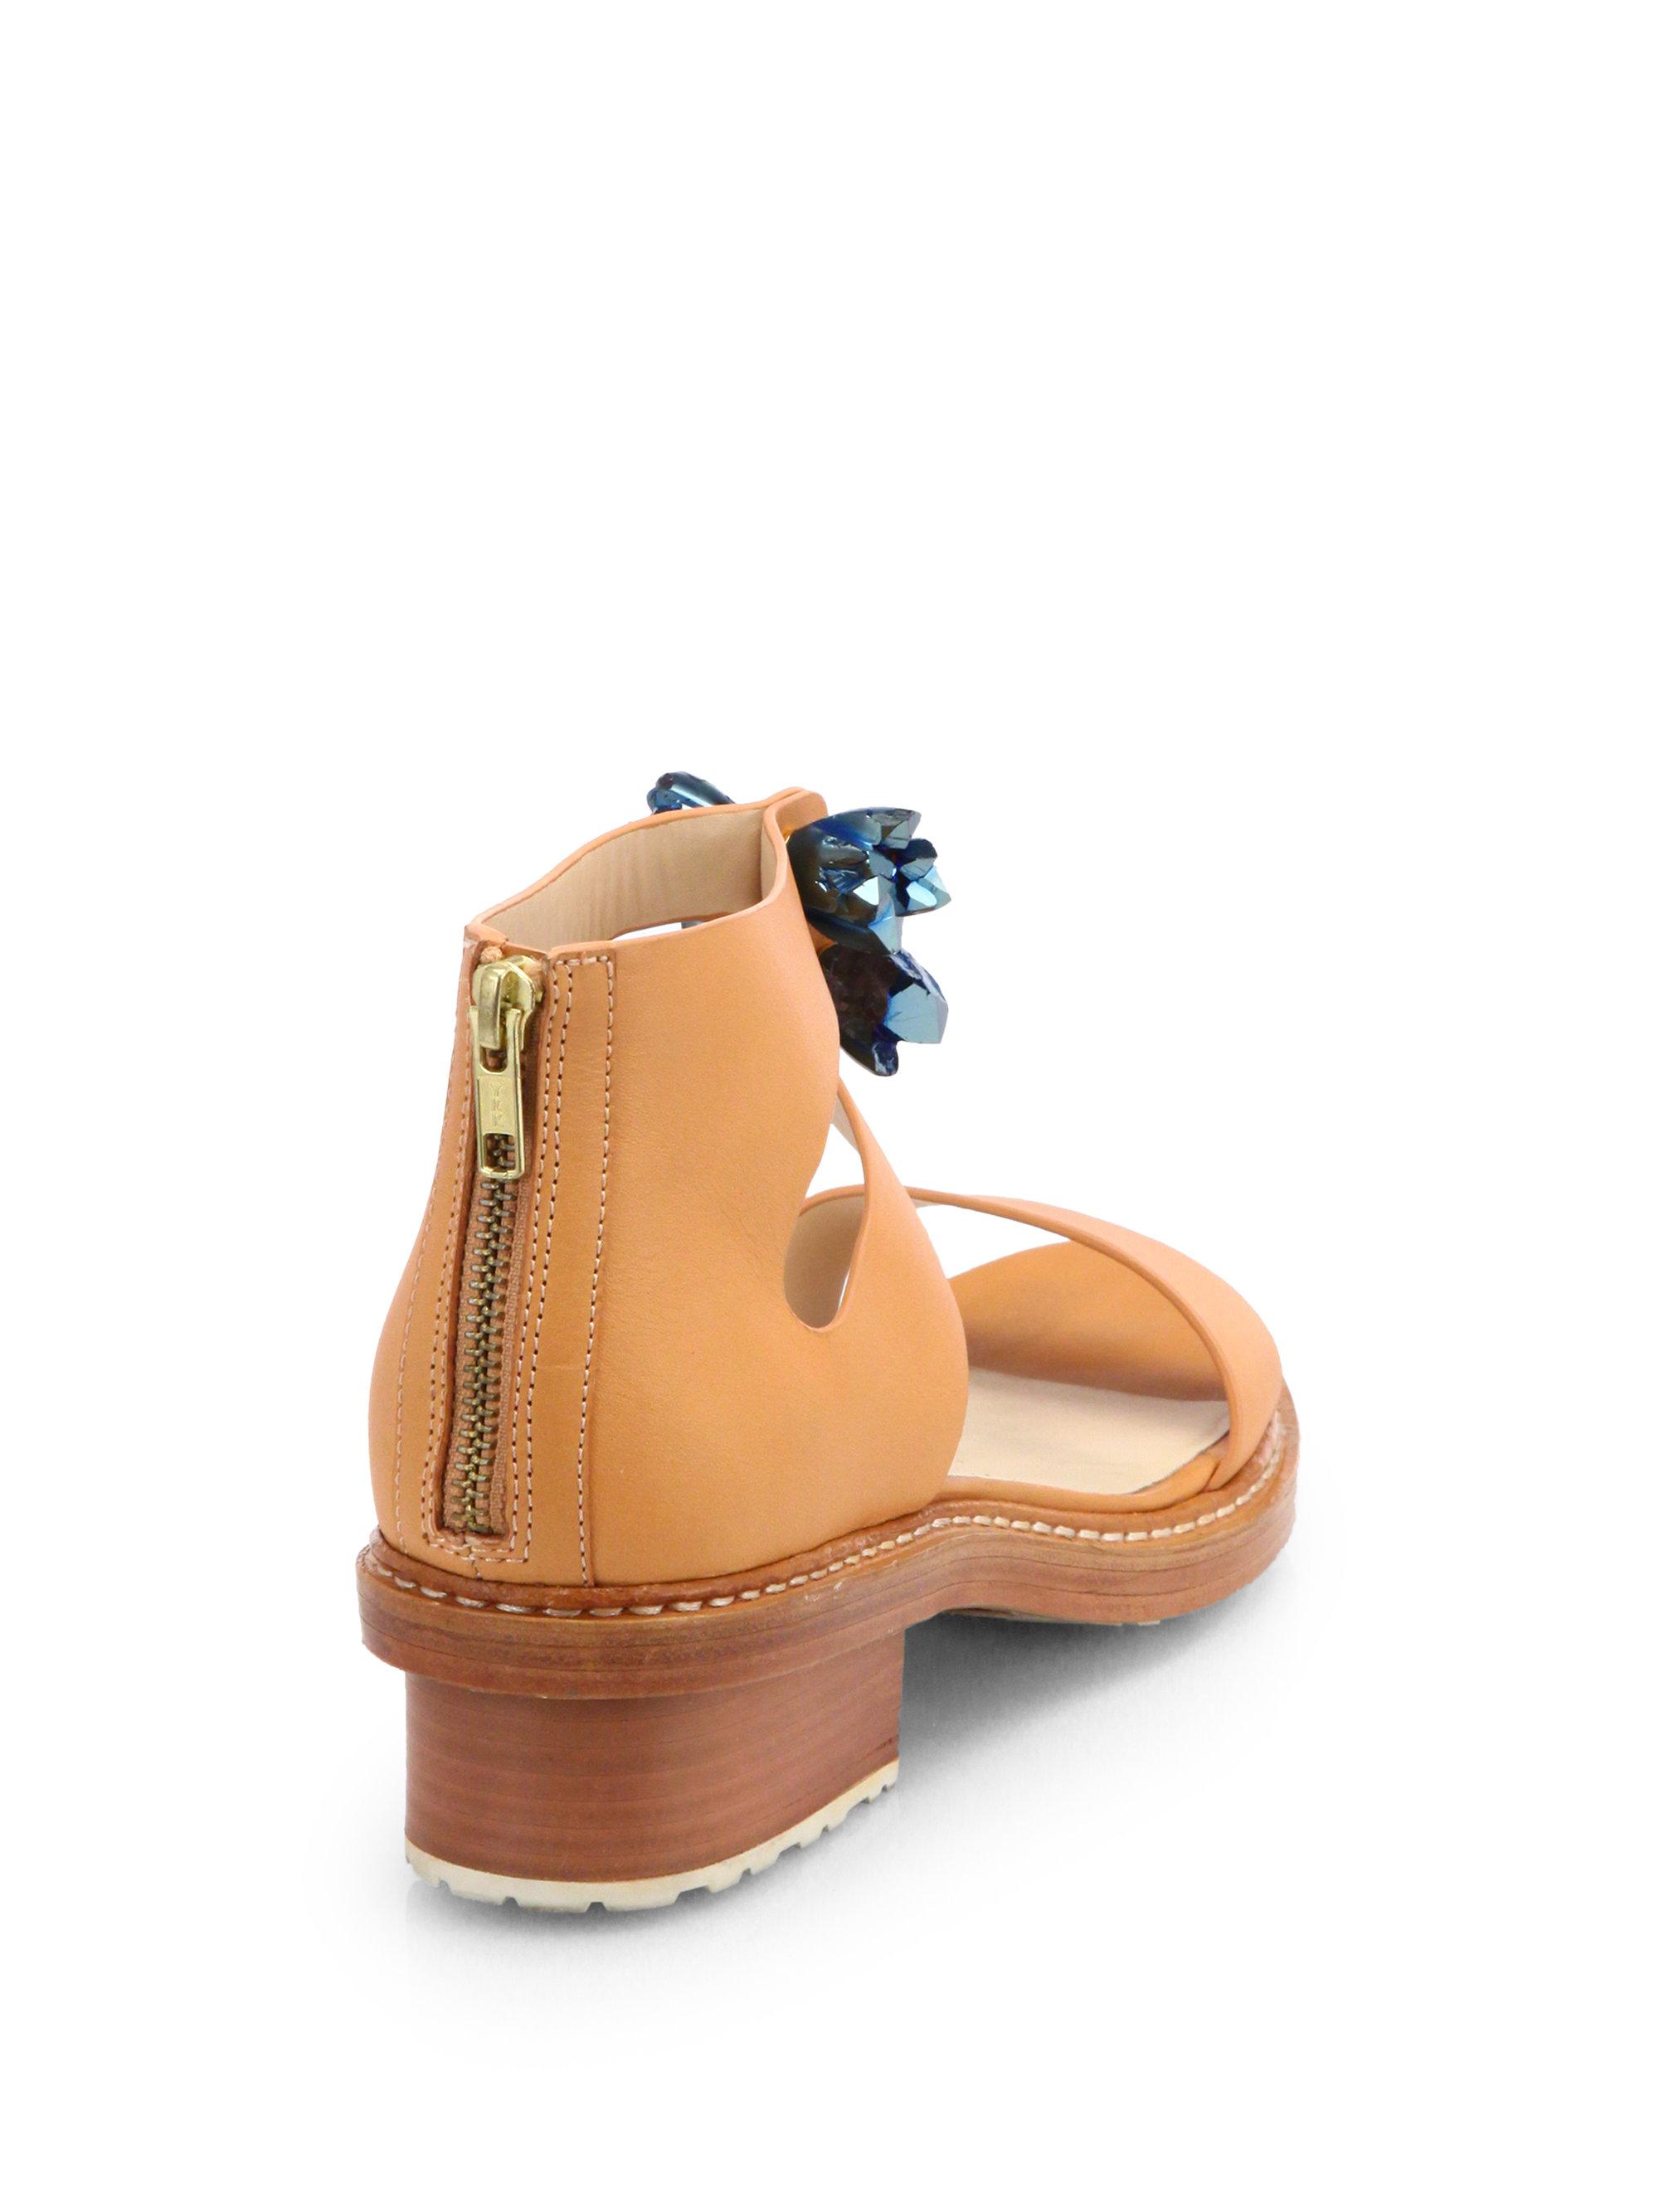 3.1 Phillip Lim Cosmic Leather Sandals release dates discount fashionable outlet affordable C09Euqdv